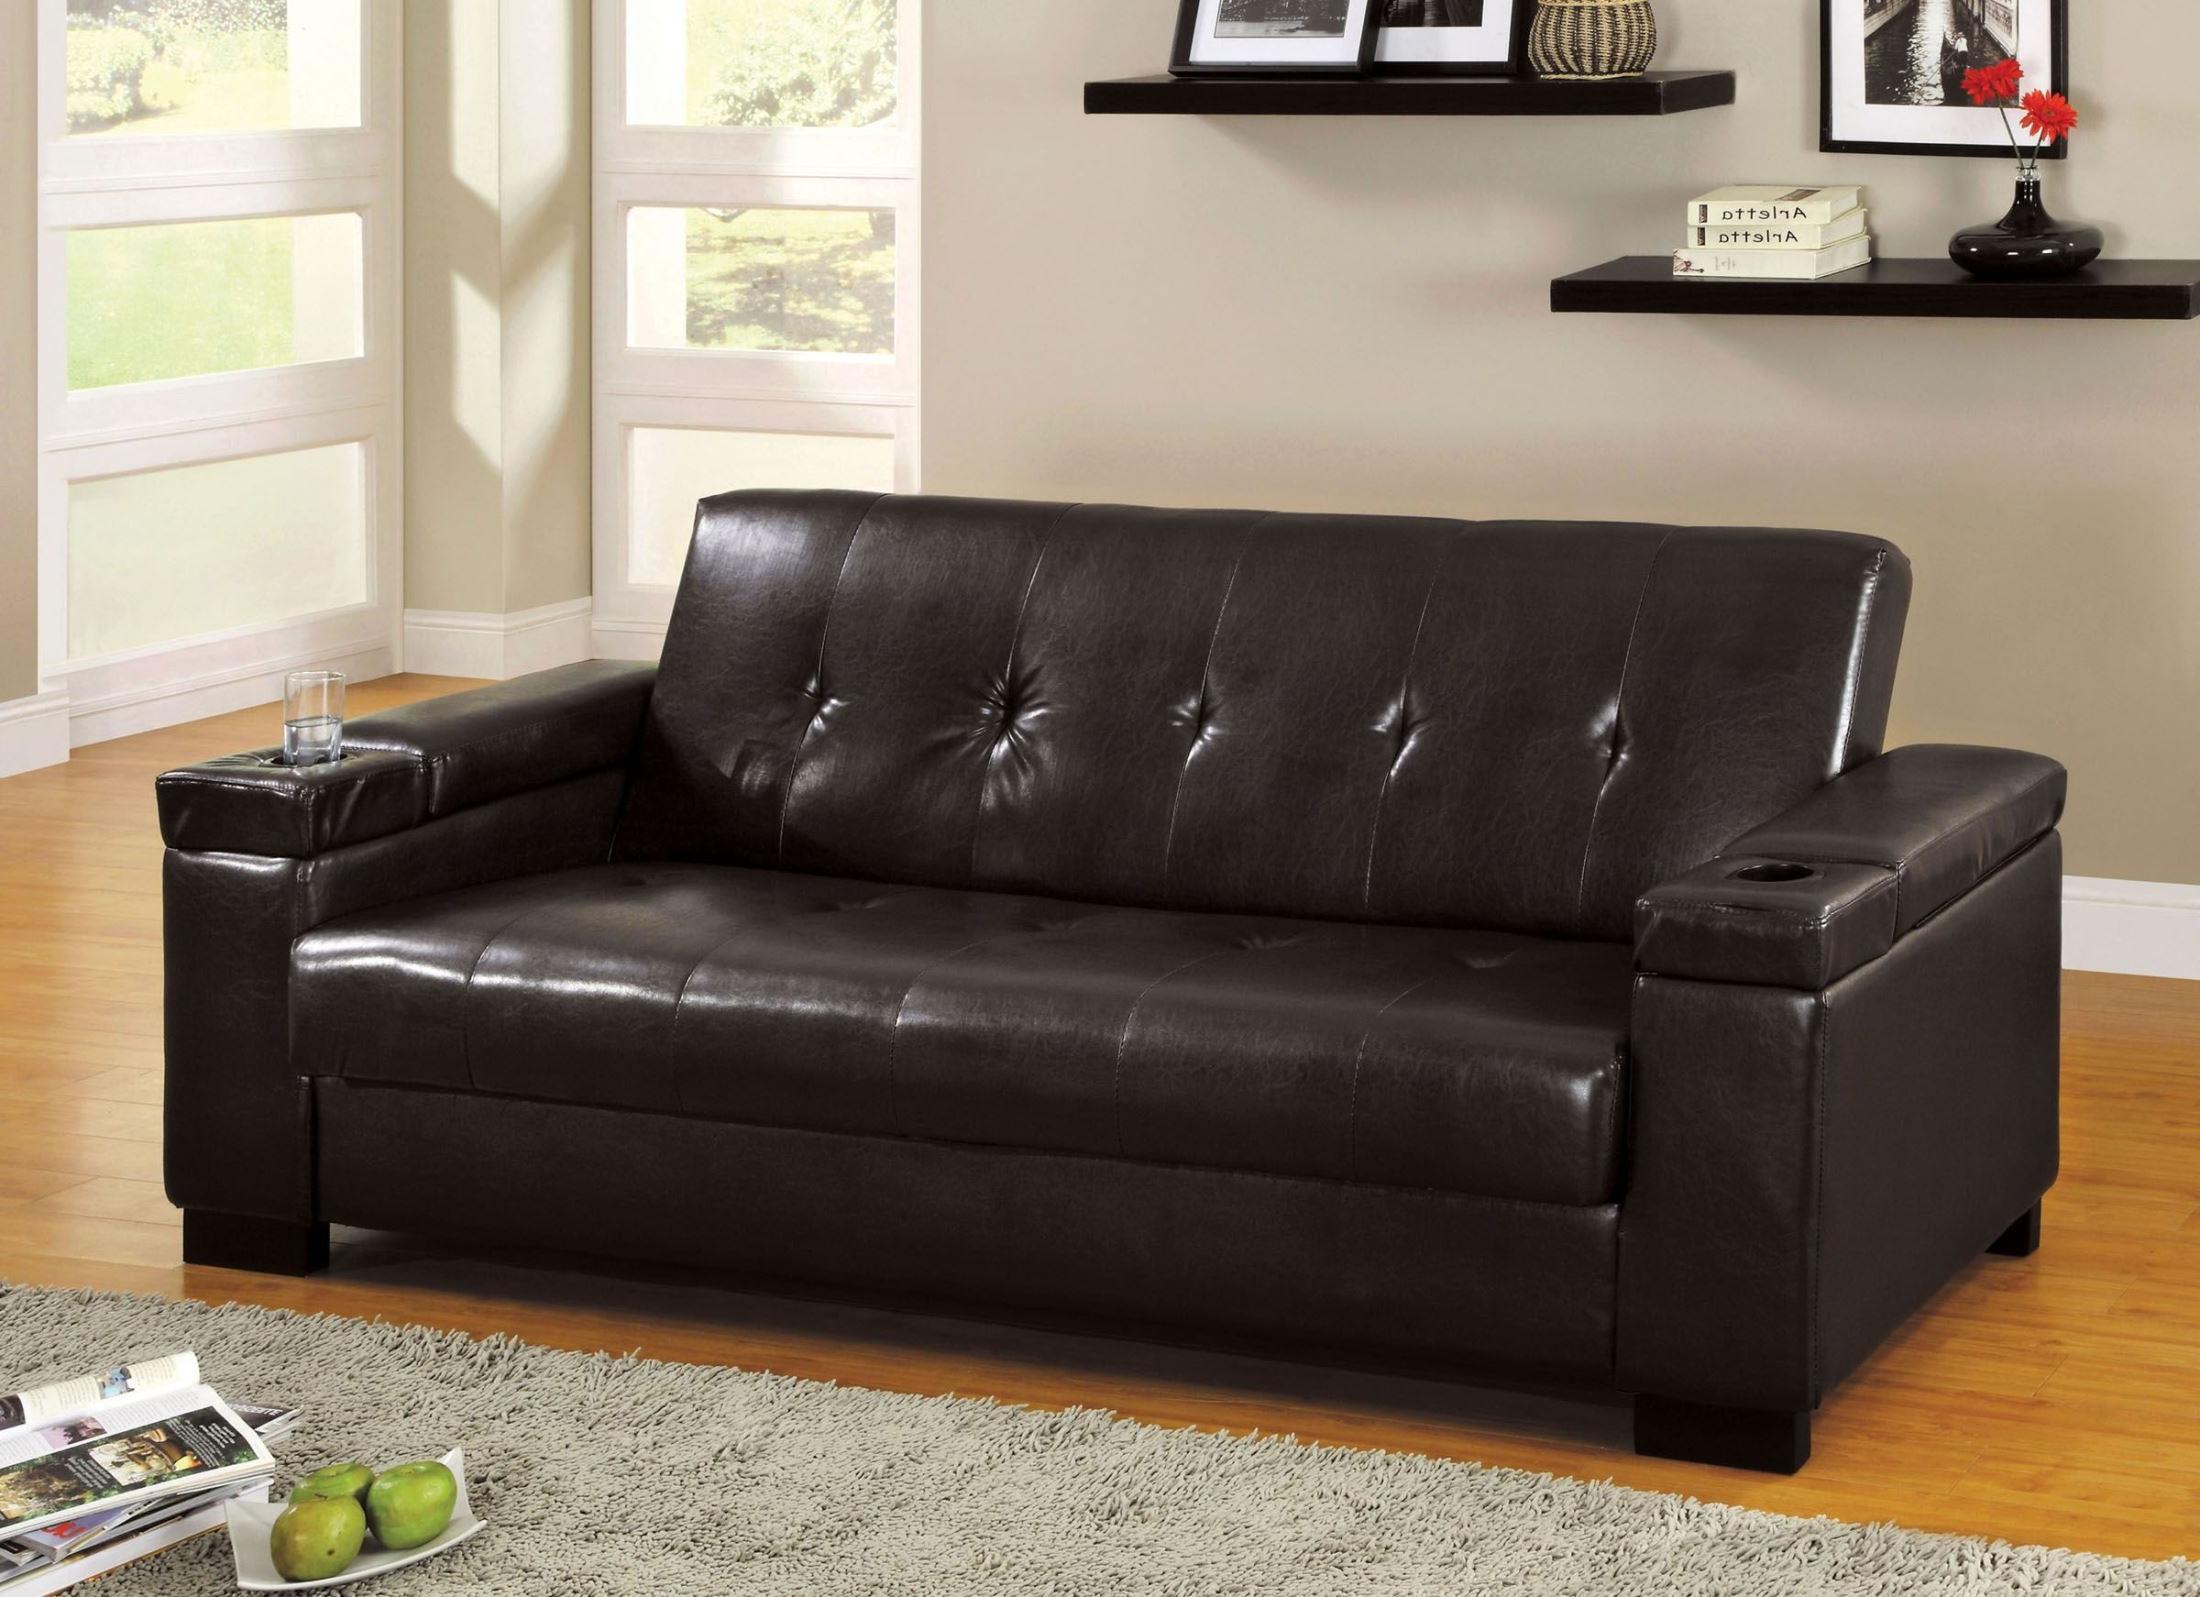 Favorite Logan Leatherette Futon Storage Sofa From Furniture Of Regarding Hartford Storage Sectional Futon Sofas (View 3 of 25)